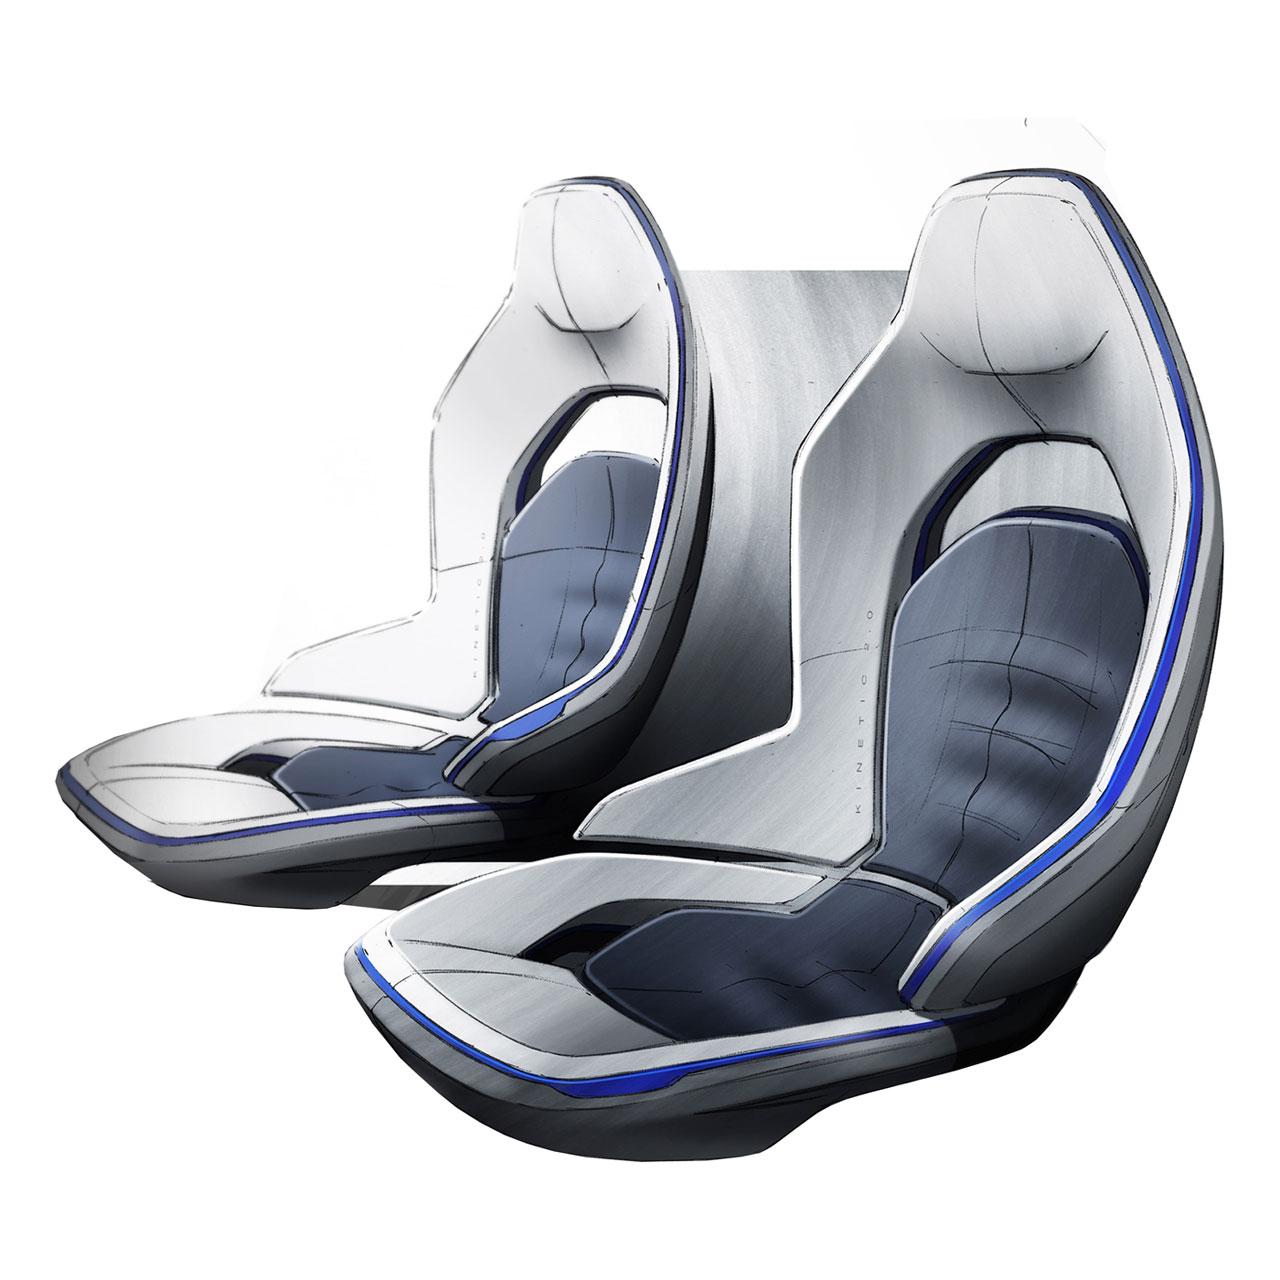 ford evos concept interior design sketch car body design. Black Bedroom Furniture Sets. Home Design Ideas